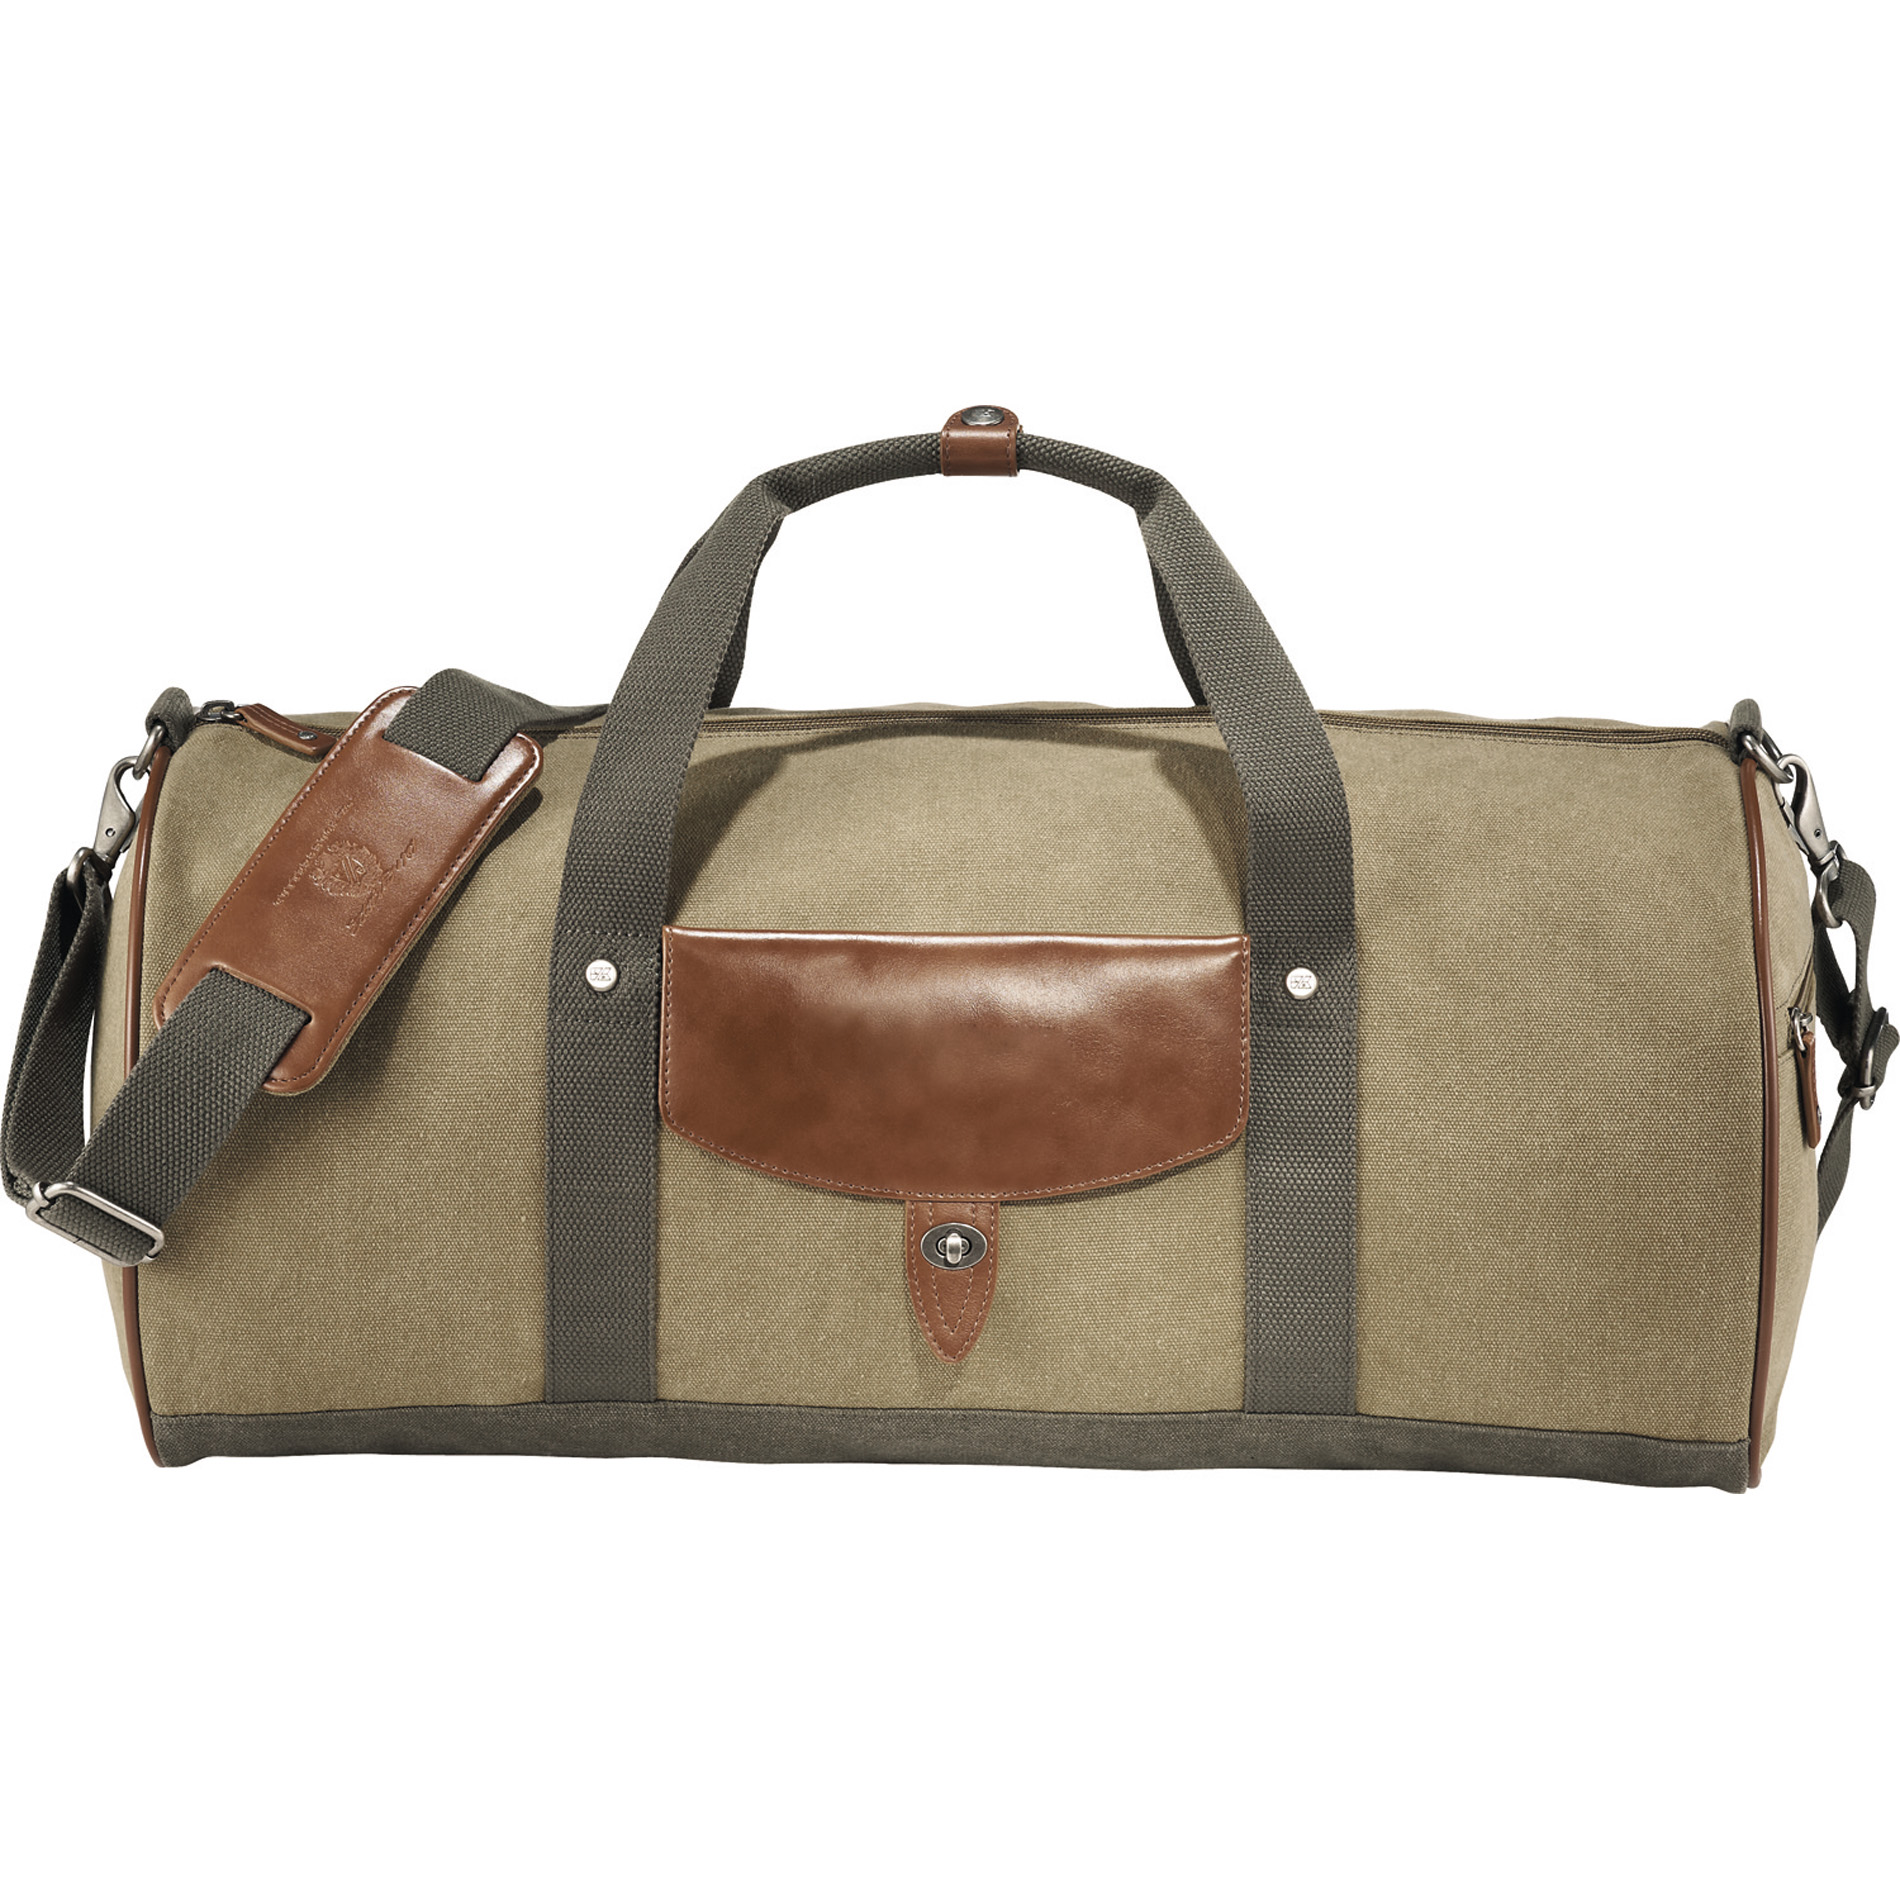 "Cutter & Buck 9840-85 - Legacy 22"" Cotton Roll Duffel Bag"